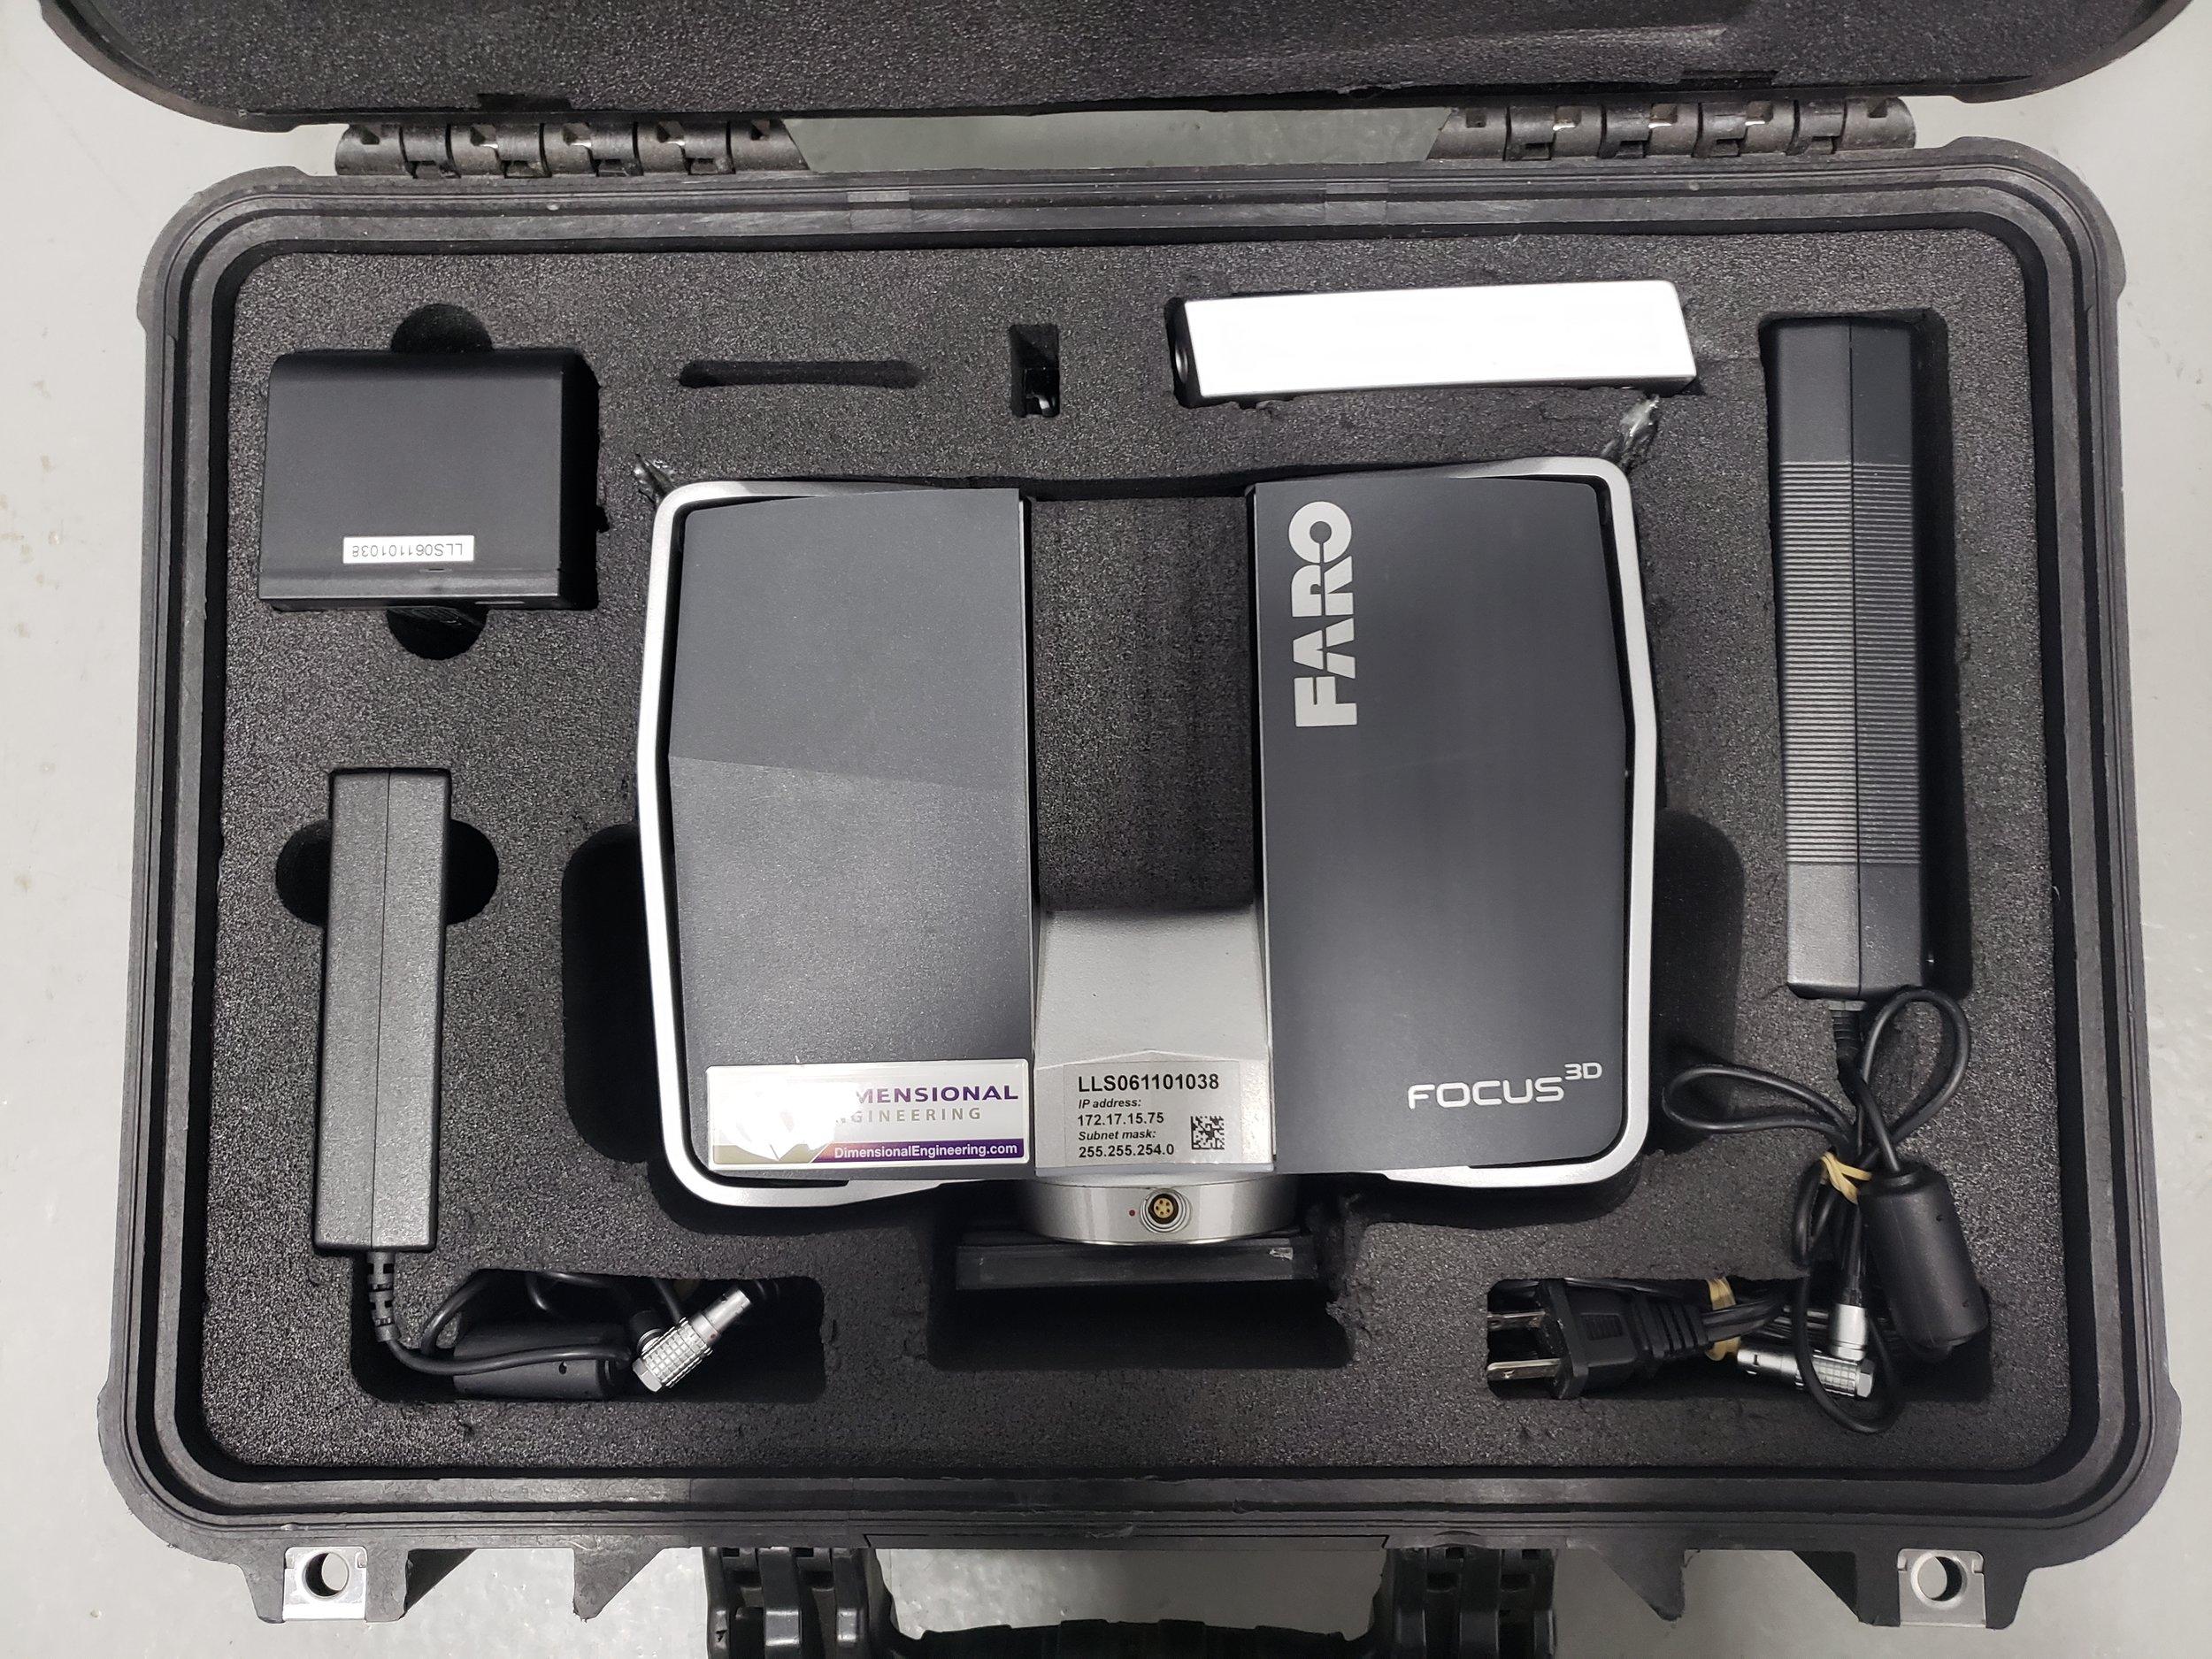 Focus 3D and Batteries.jpg